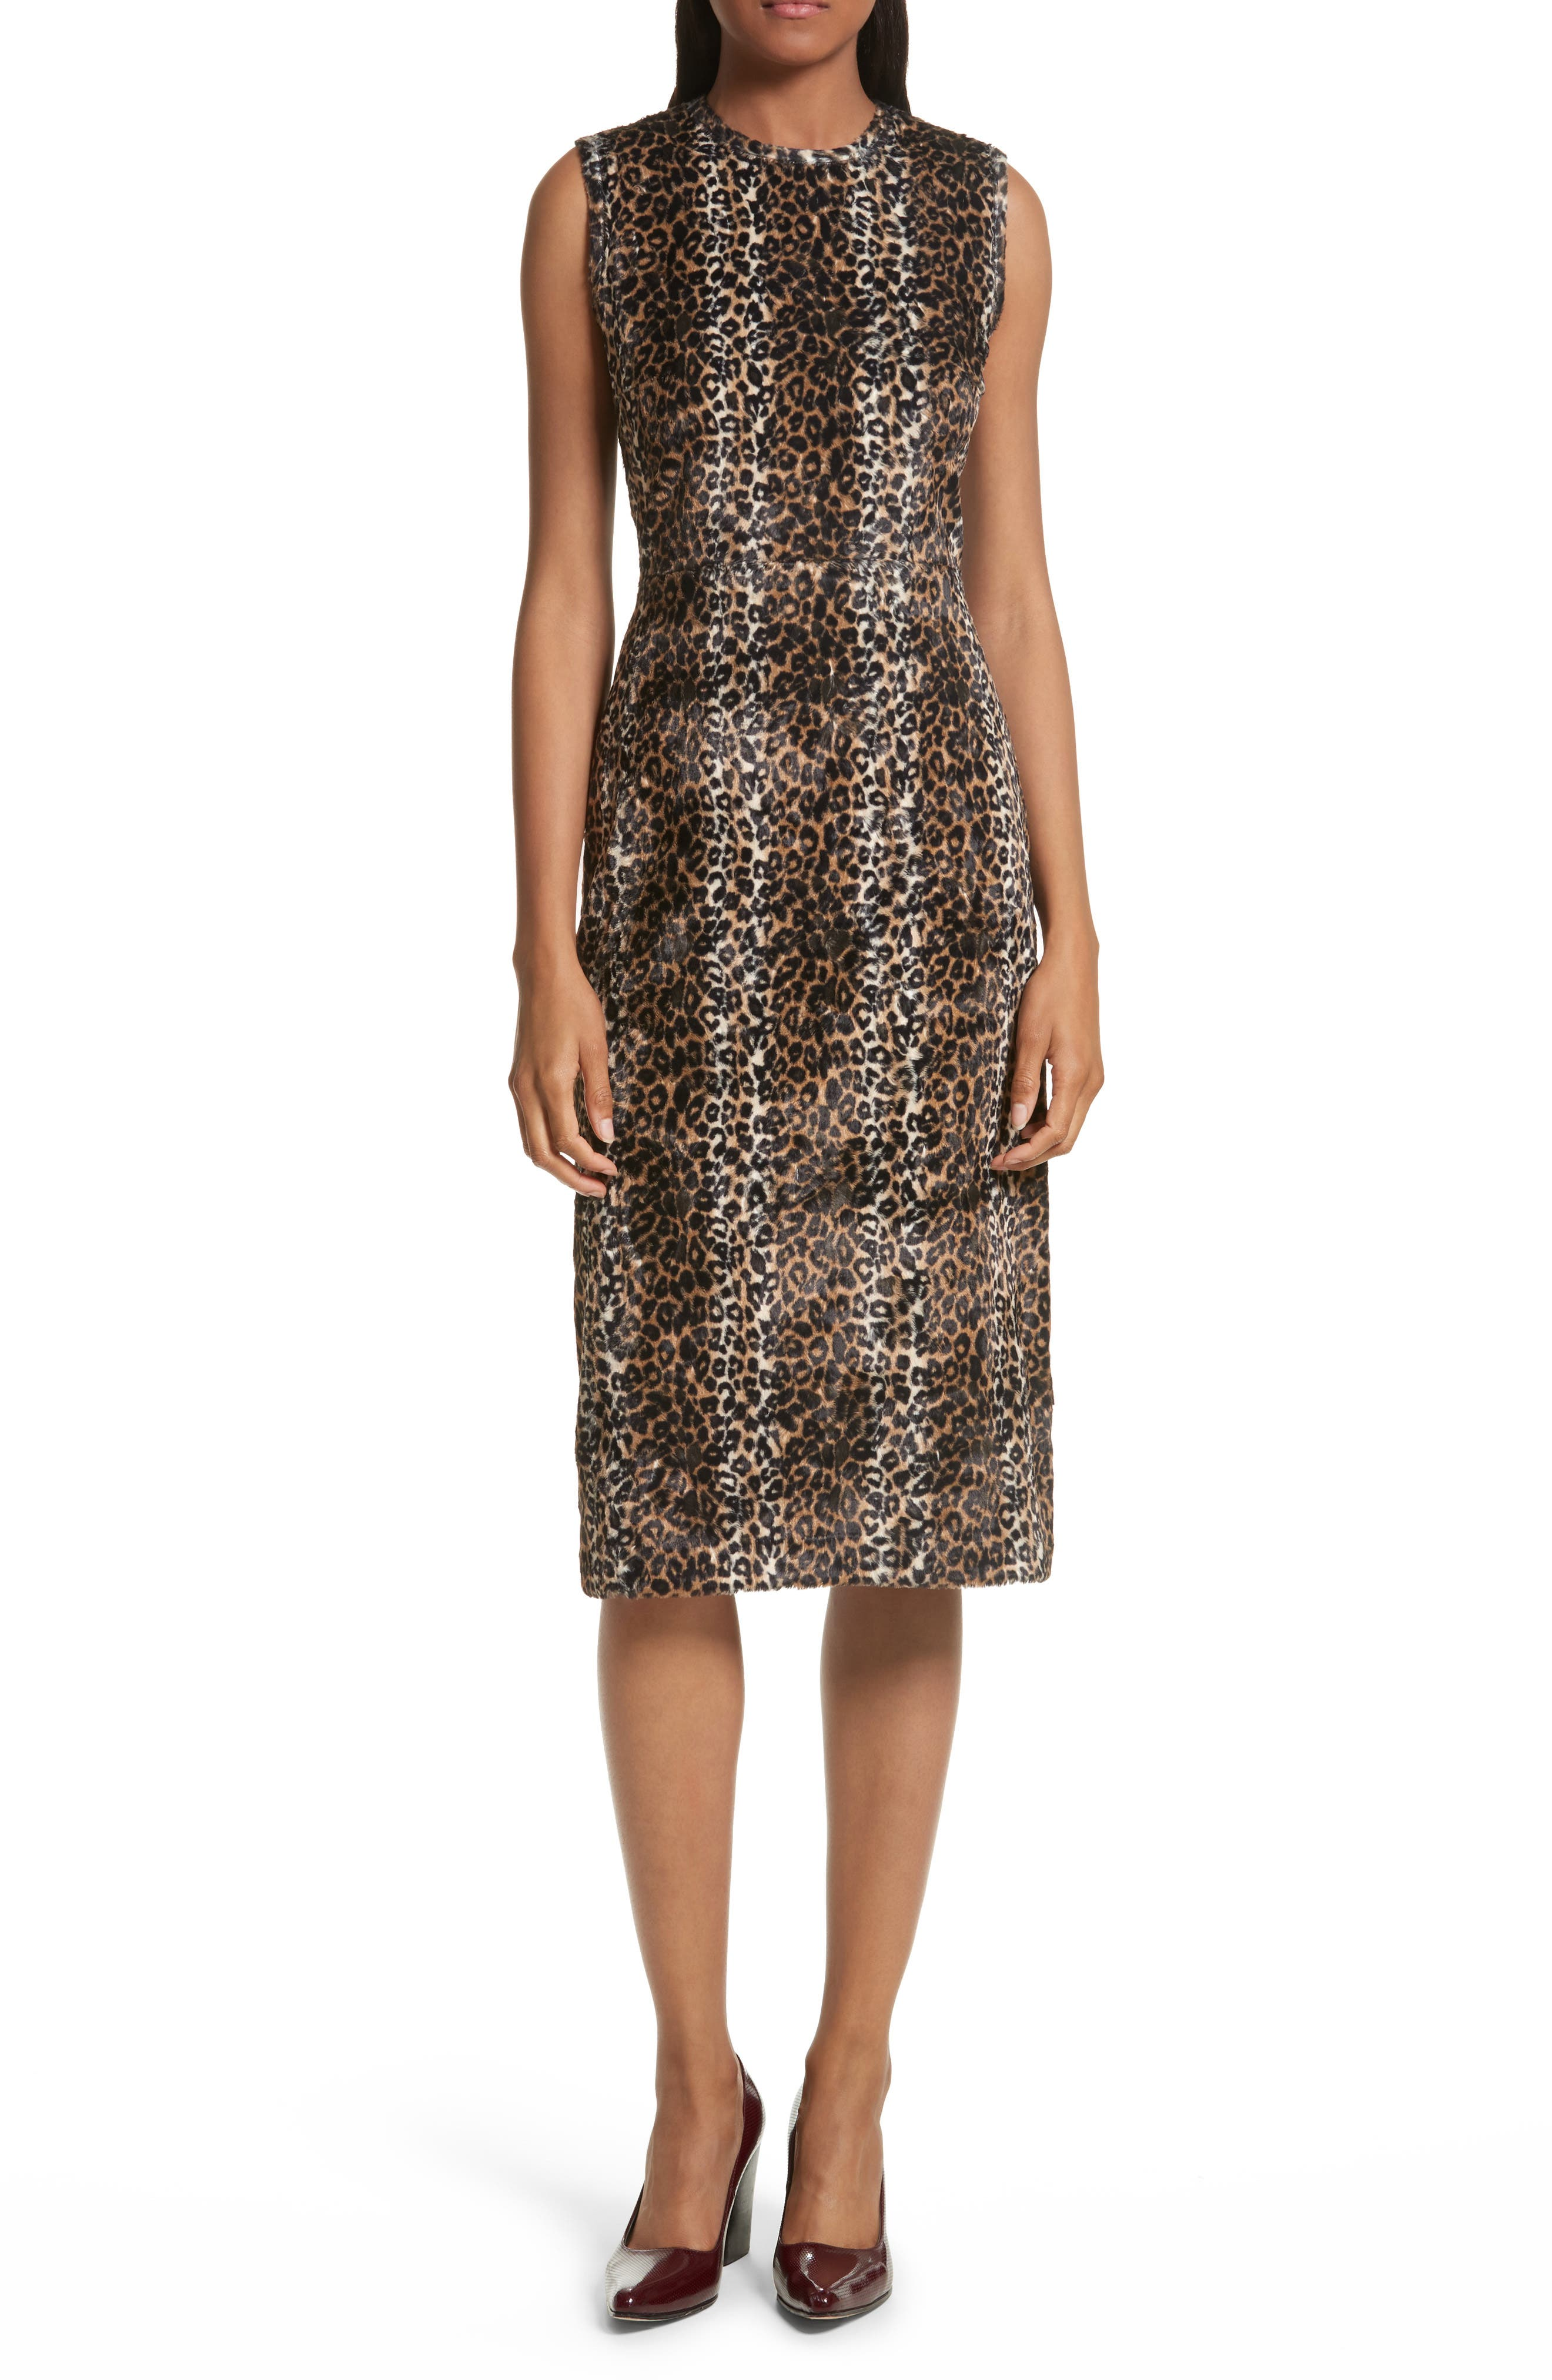 Alternate Image 1 Selected - Rachel Comey Sling Cheetah Faux Fur Sheath Dress